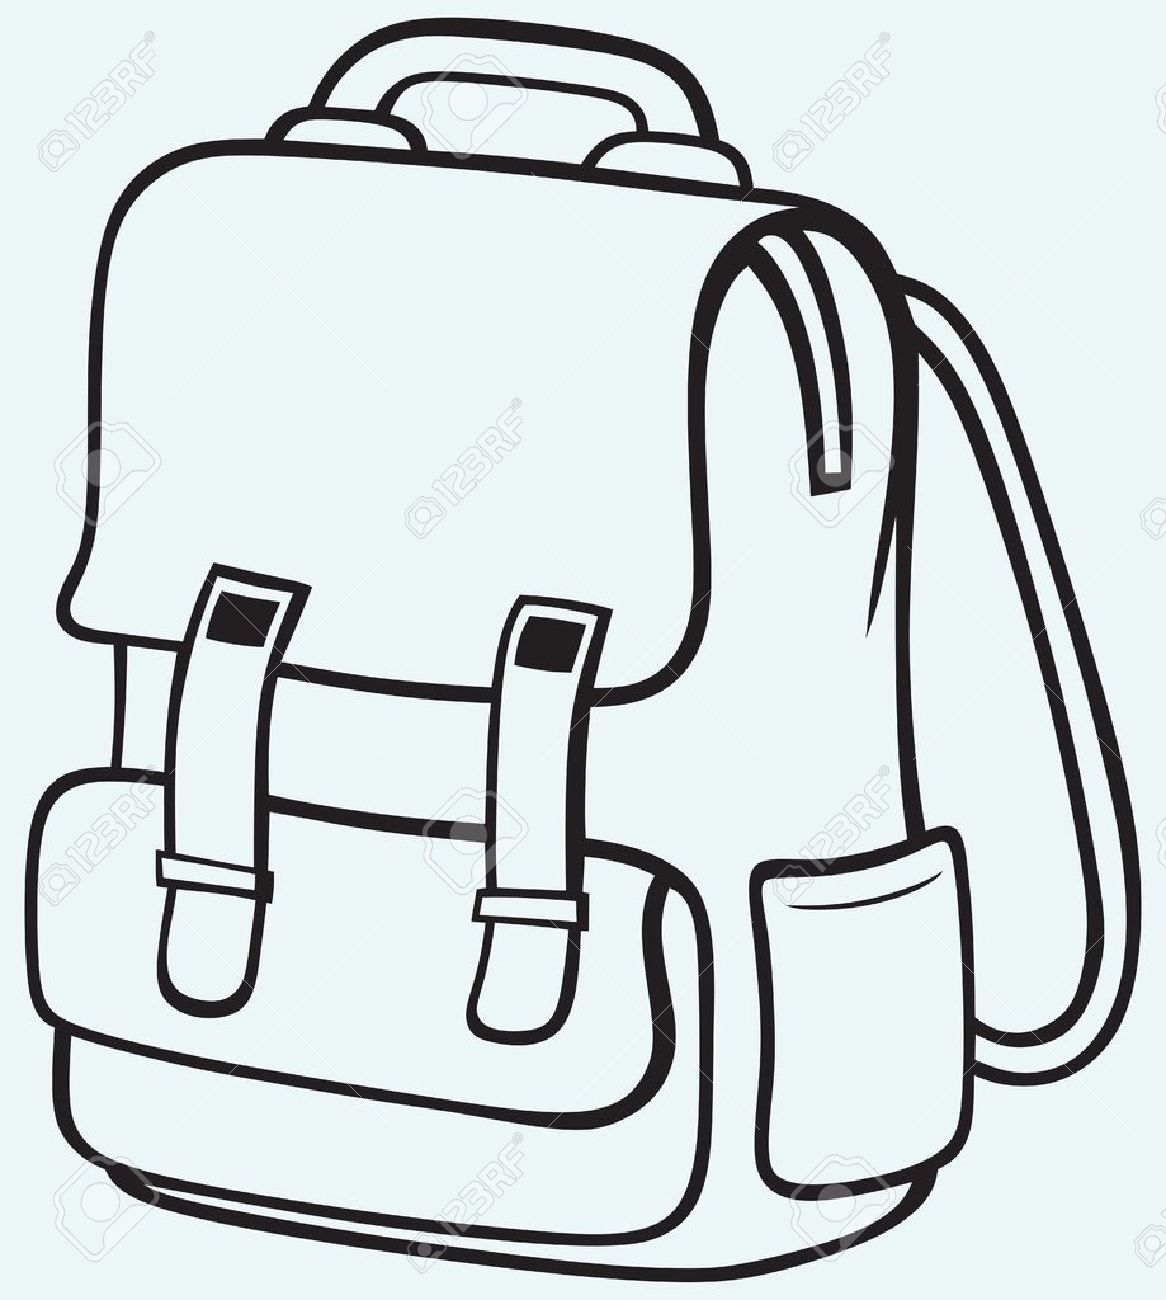 School Bag Cartoon Black And White.